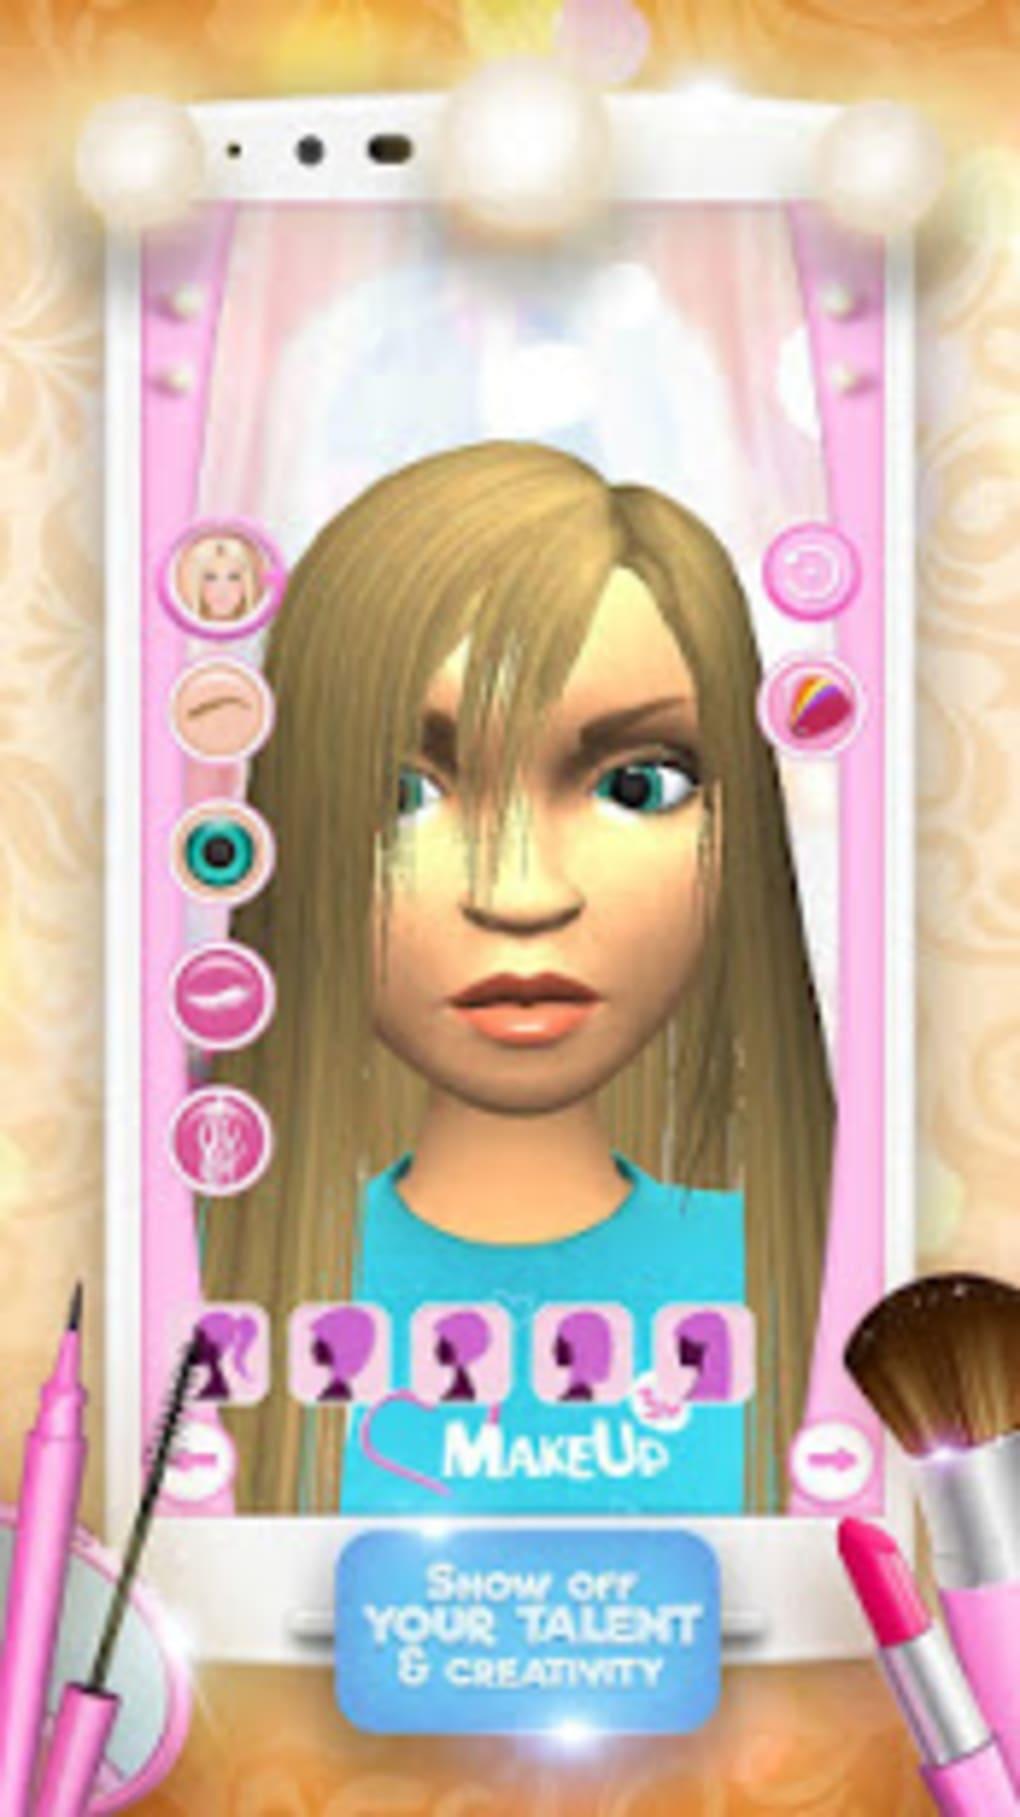 ... 3D Makeup Games For Girls ...